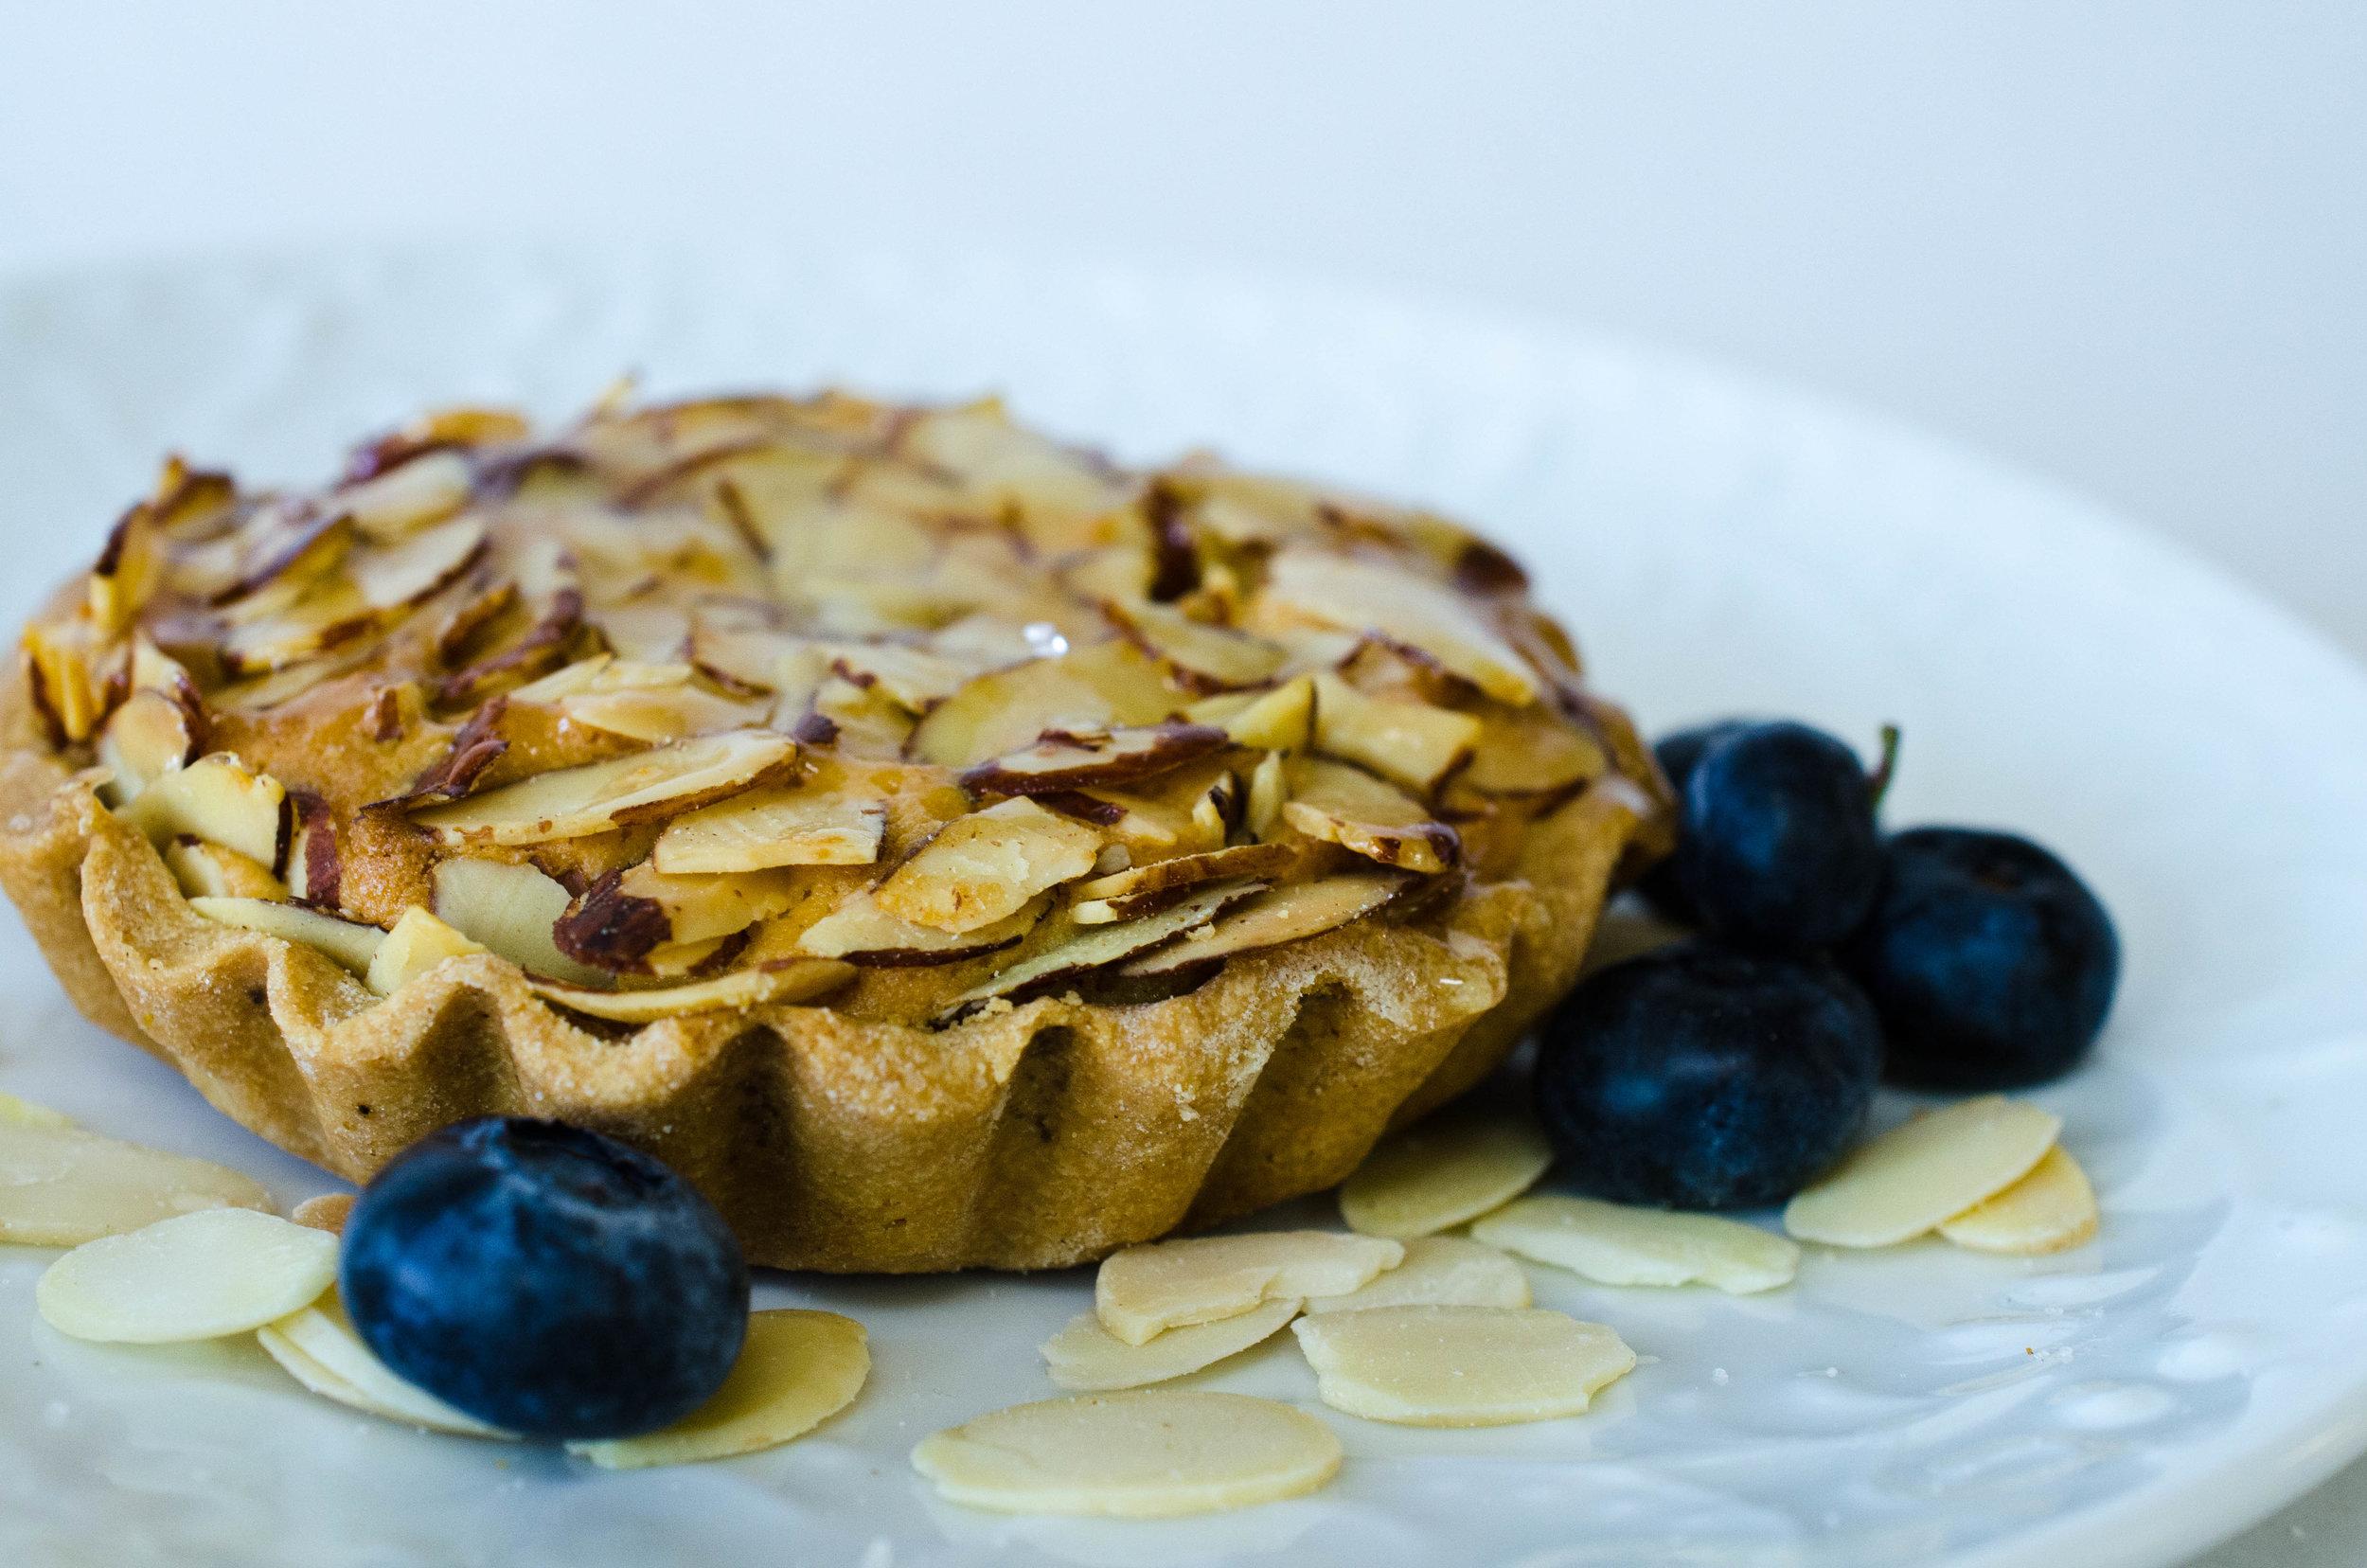 Almond Tart (w/ blueberries)